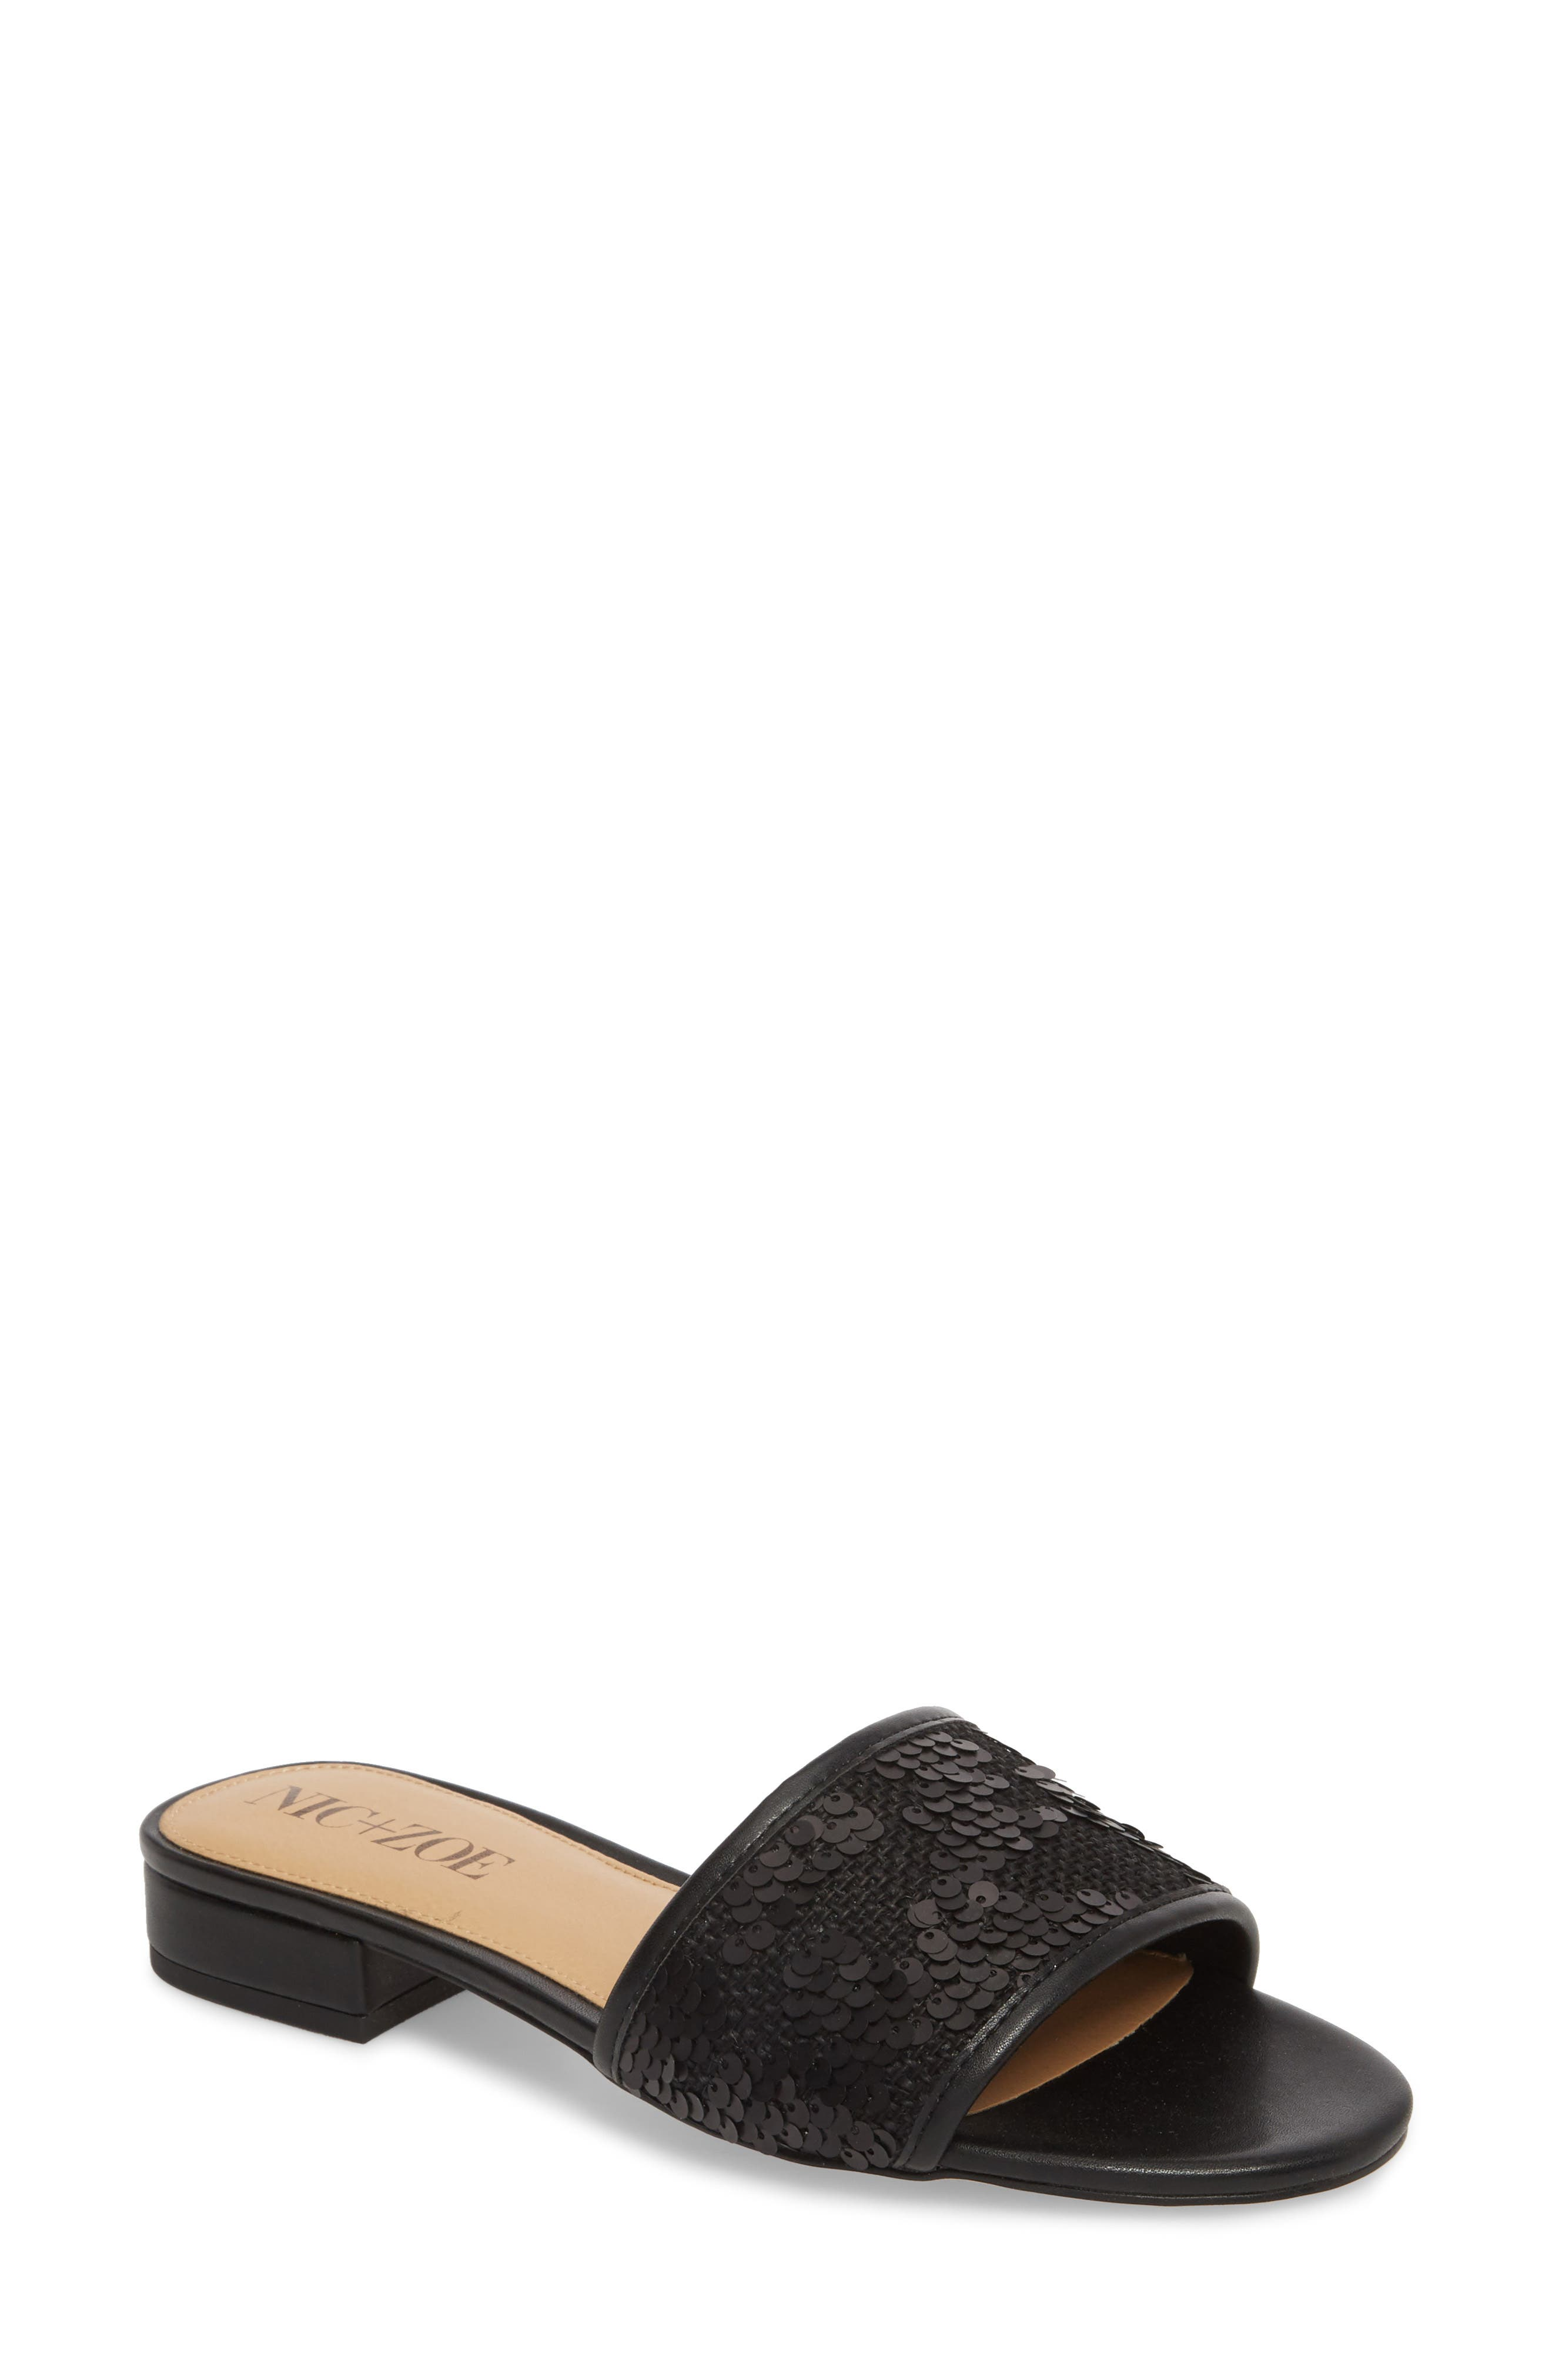 NIC + ZOE Sandy Sequin Low Heel Slide,                             Main thumbnail 1, color,                             BLACK FABRIC